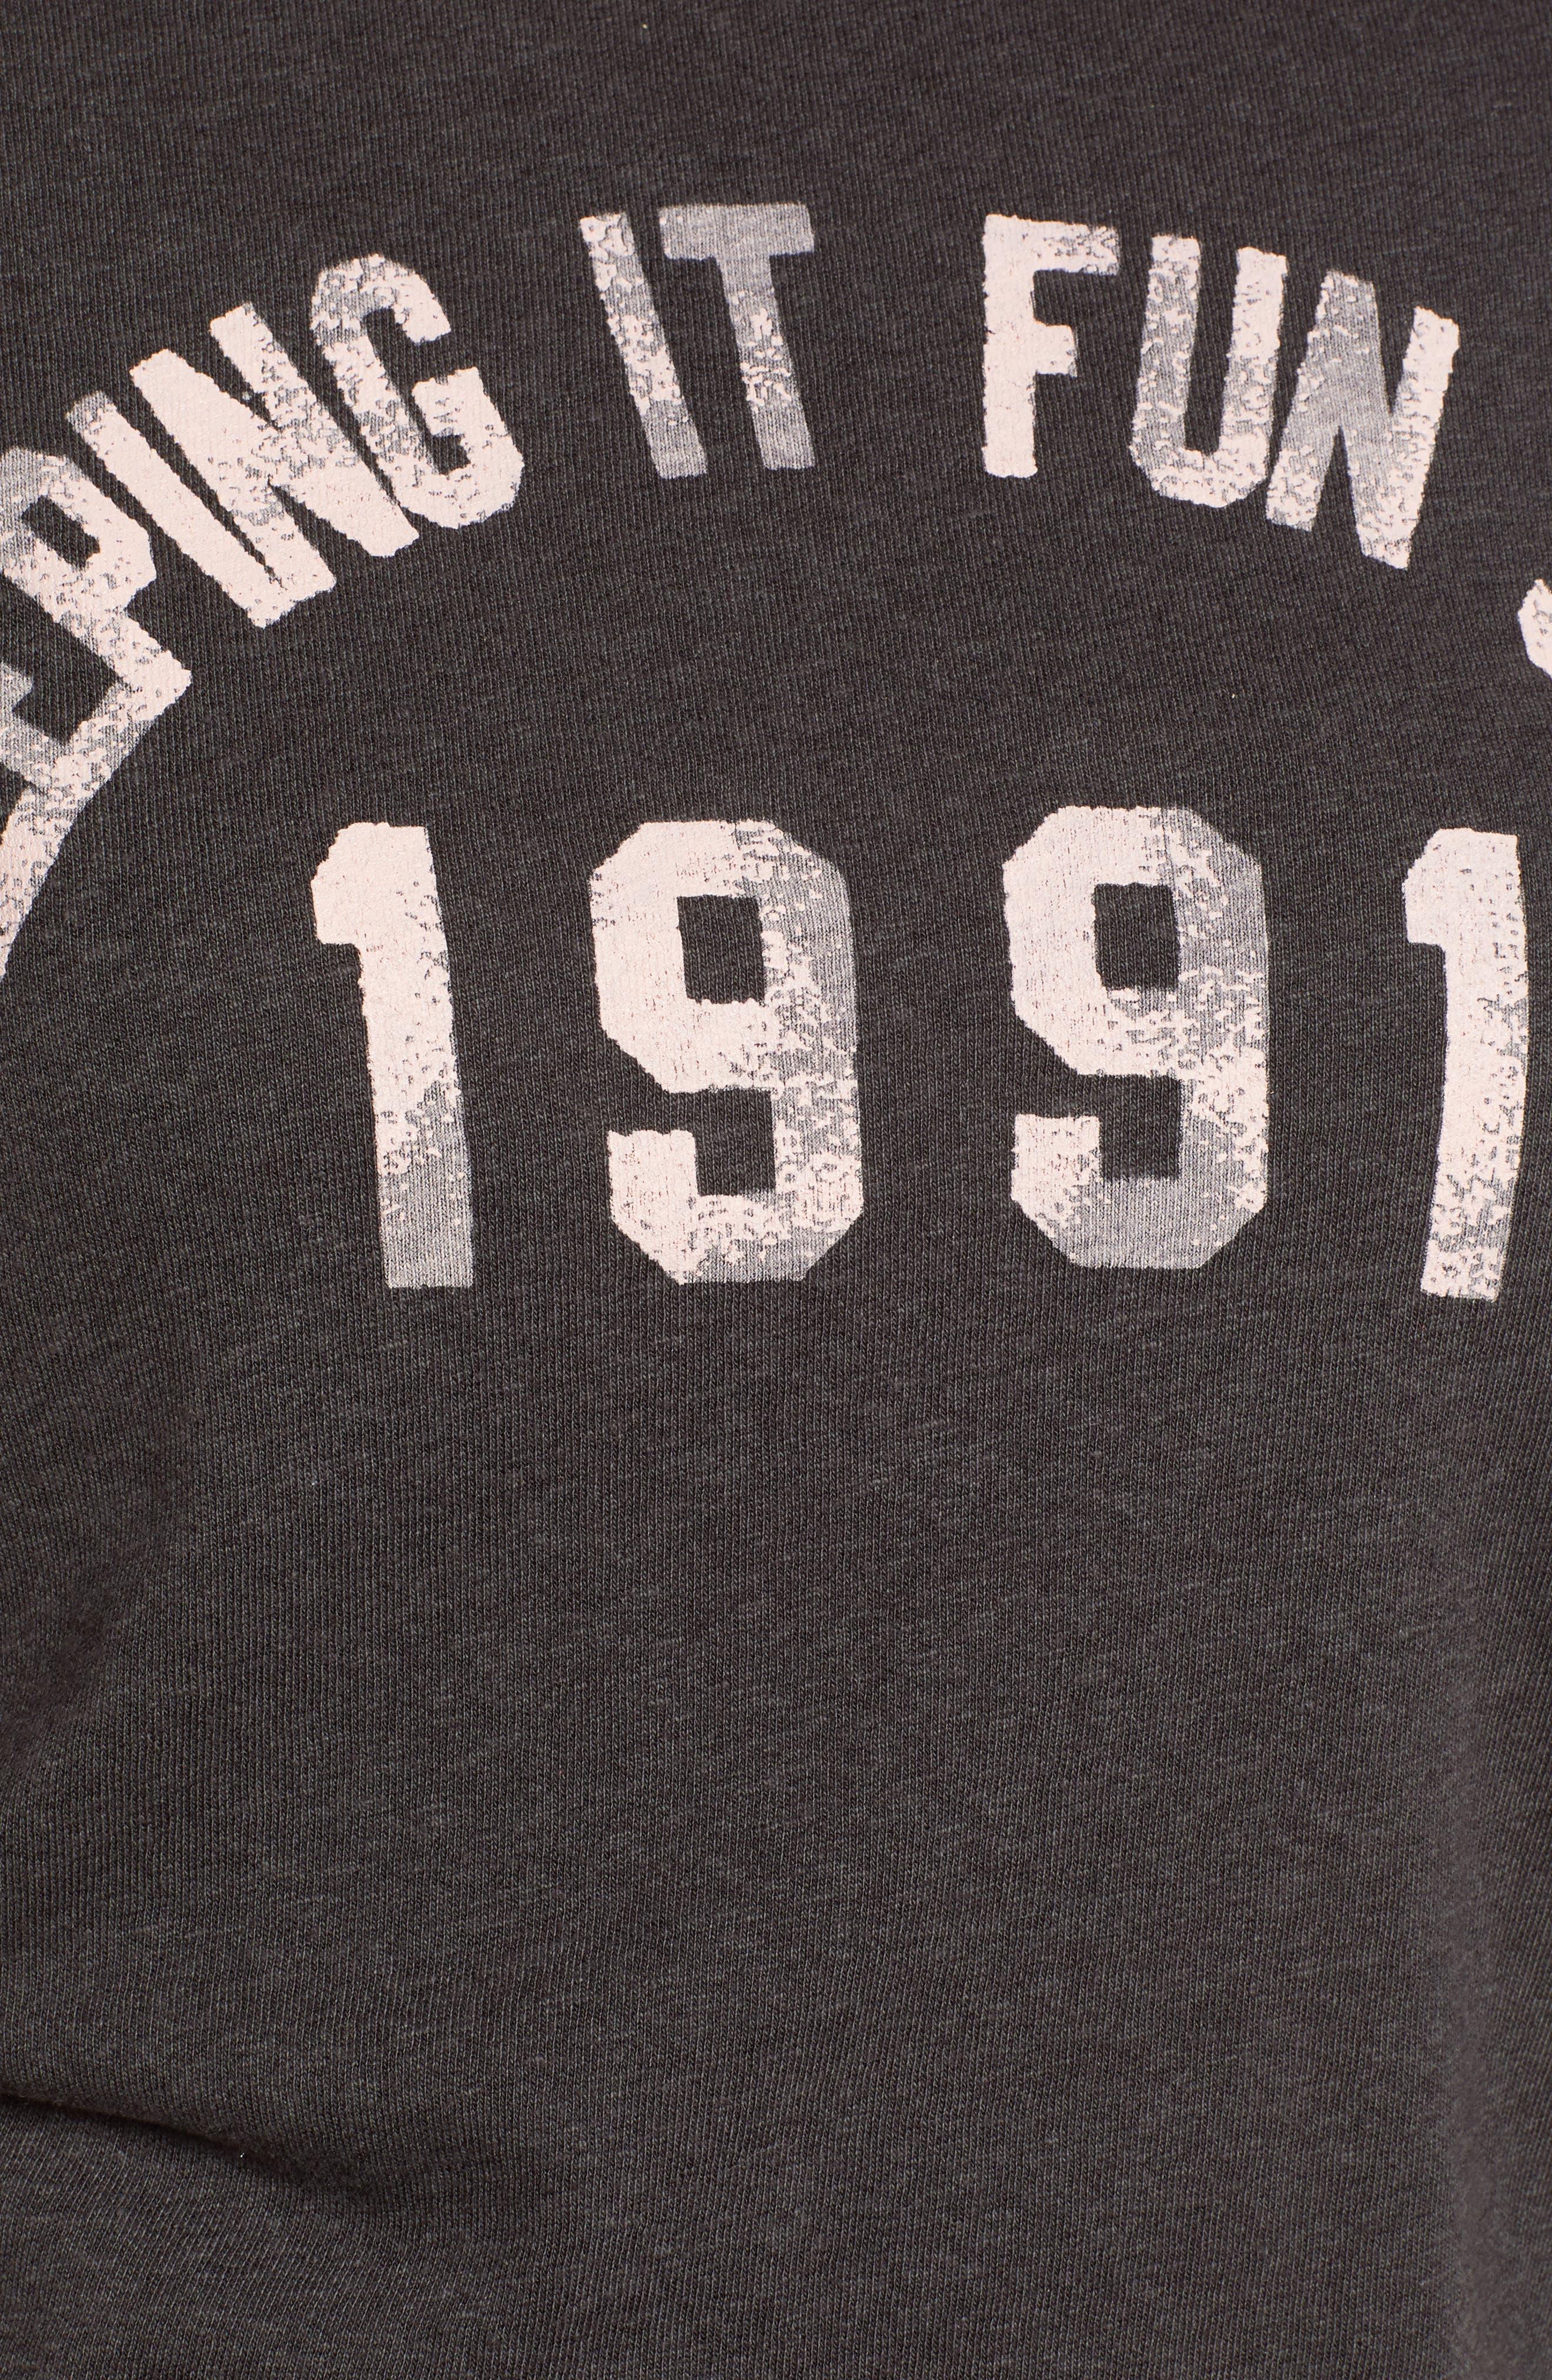 Keeping It Fun Since 1991 Tee,                             Alternate thumbnail 6, color,                             004